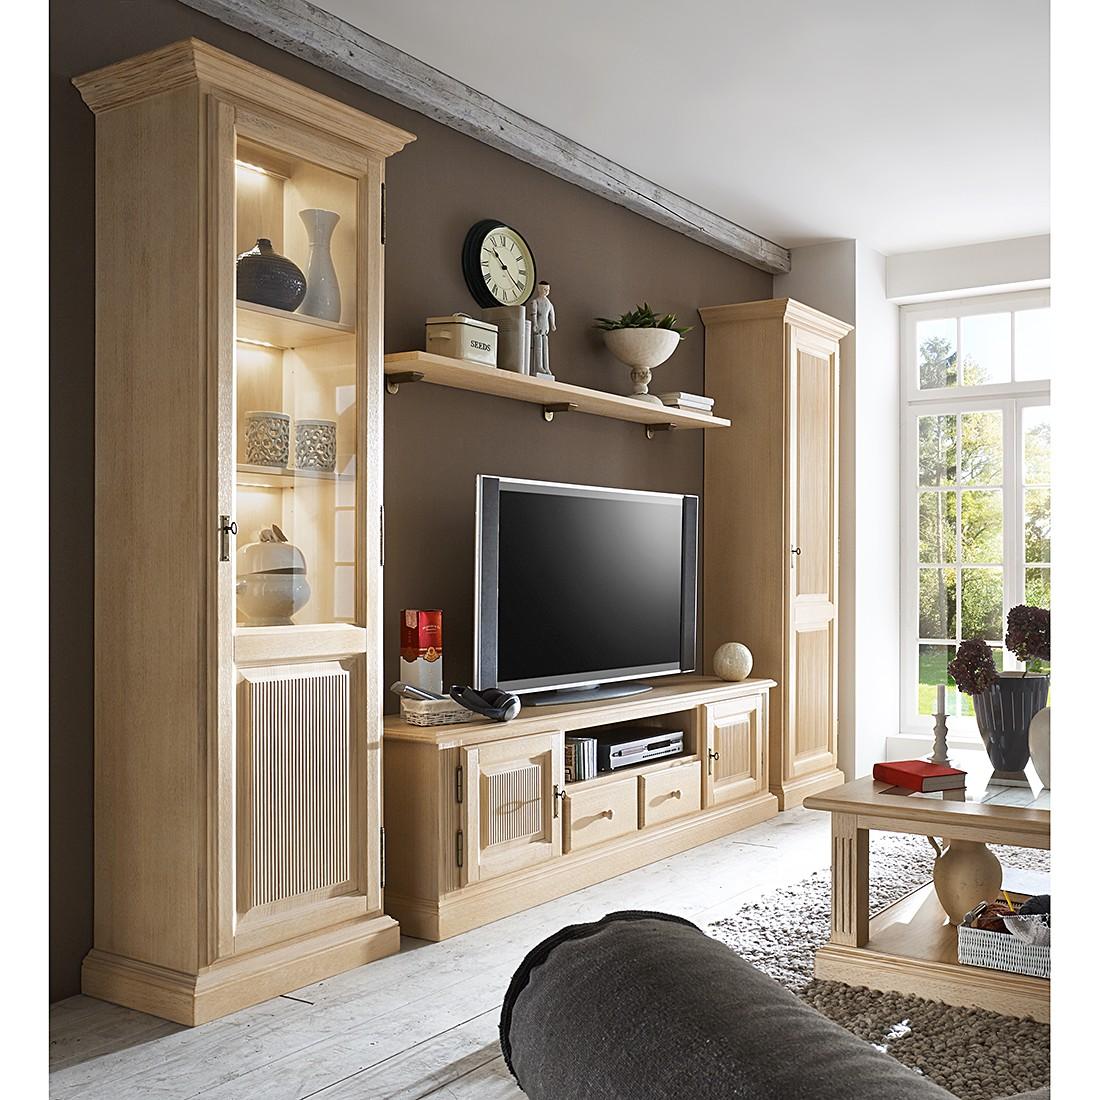 Ensemble de meubles TV Breddin I (4 éléments) - Pin massif - Sans éclairage, Ridgevalley